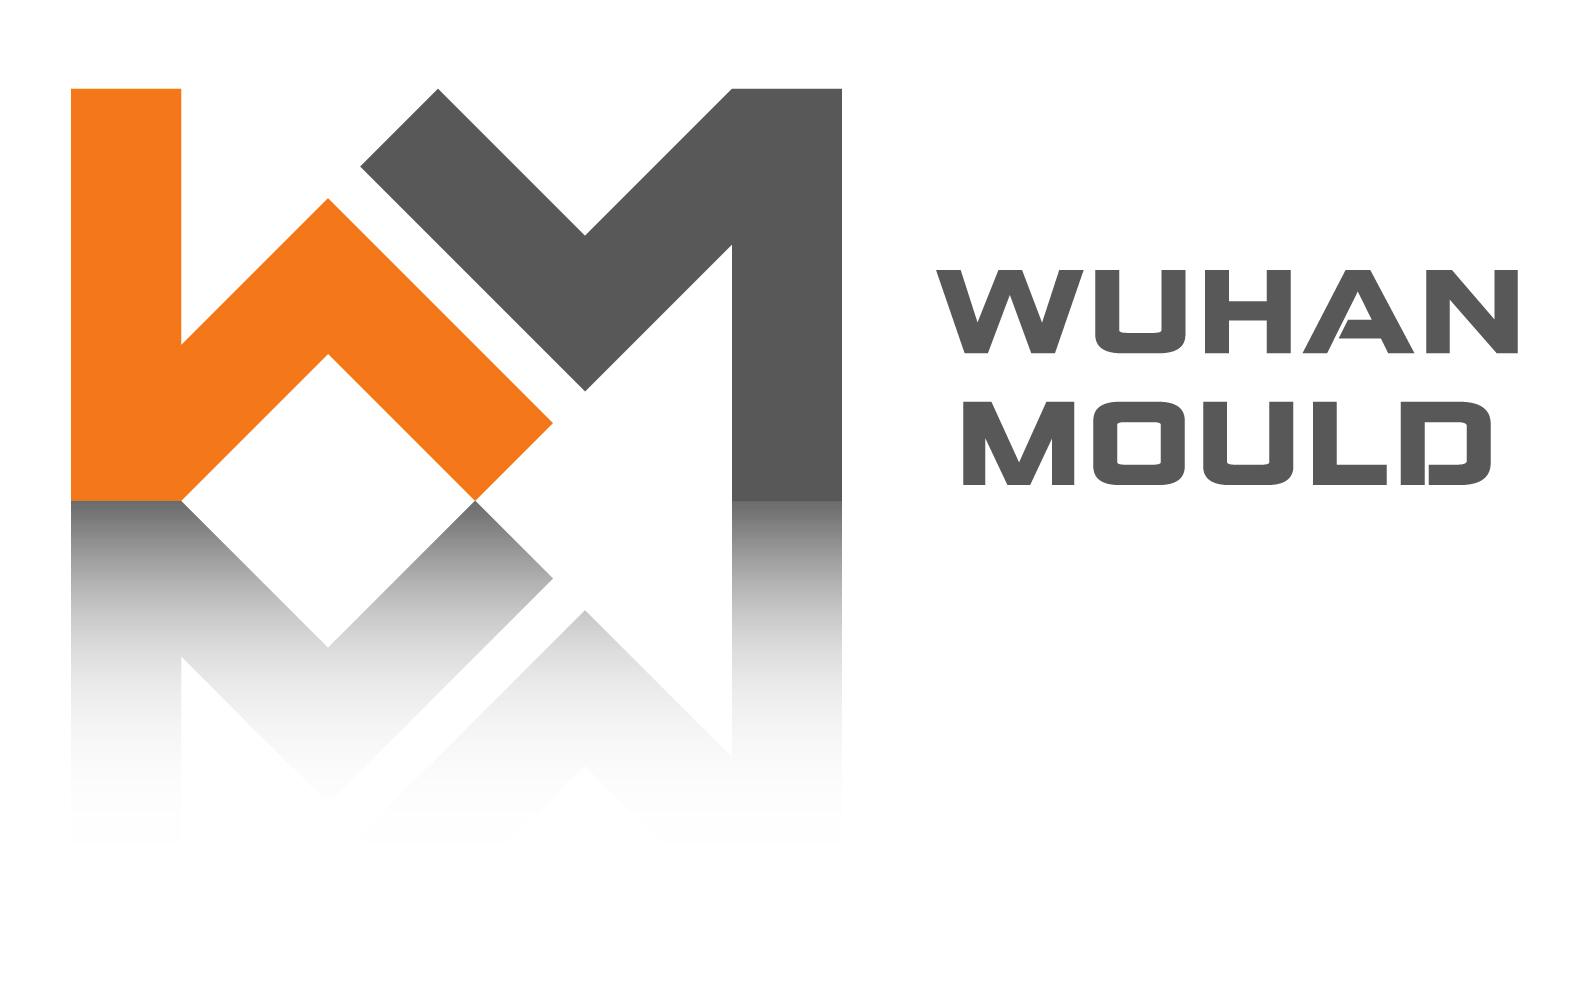 Создать логотип для фабрики пресс-форм фото f_8805989b342a7510.jpg